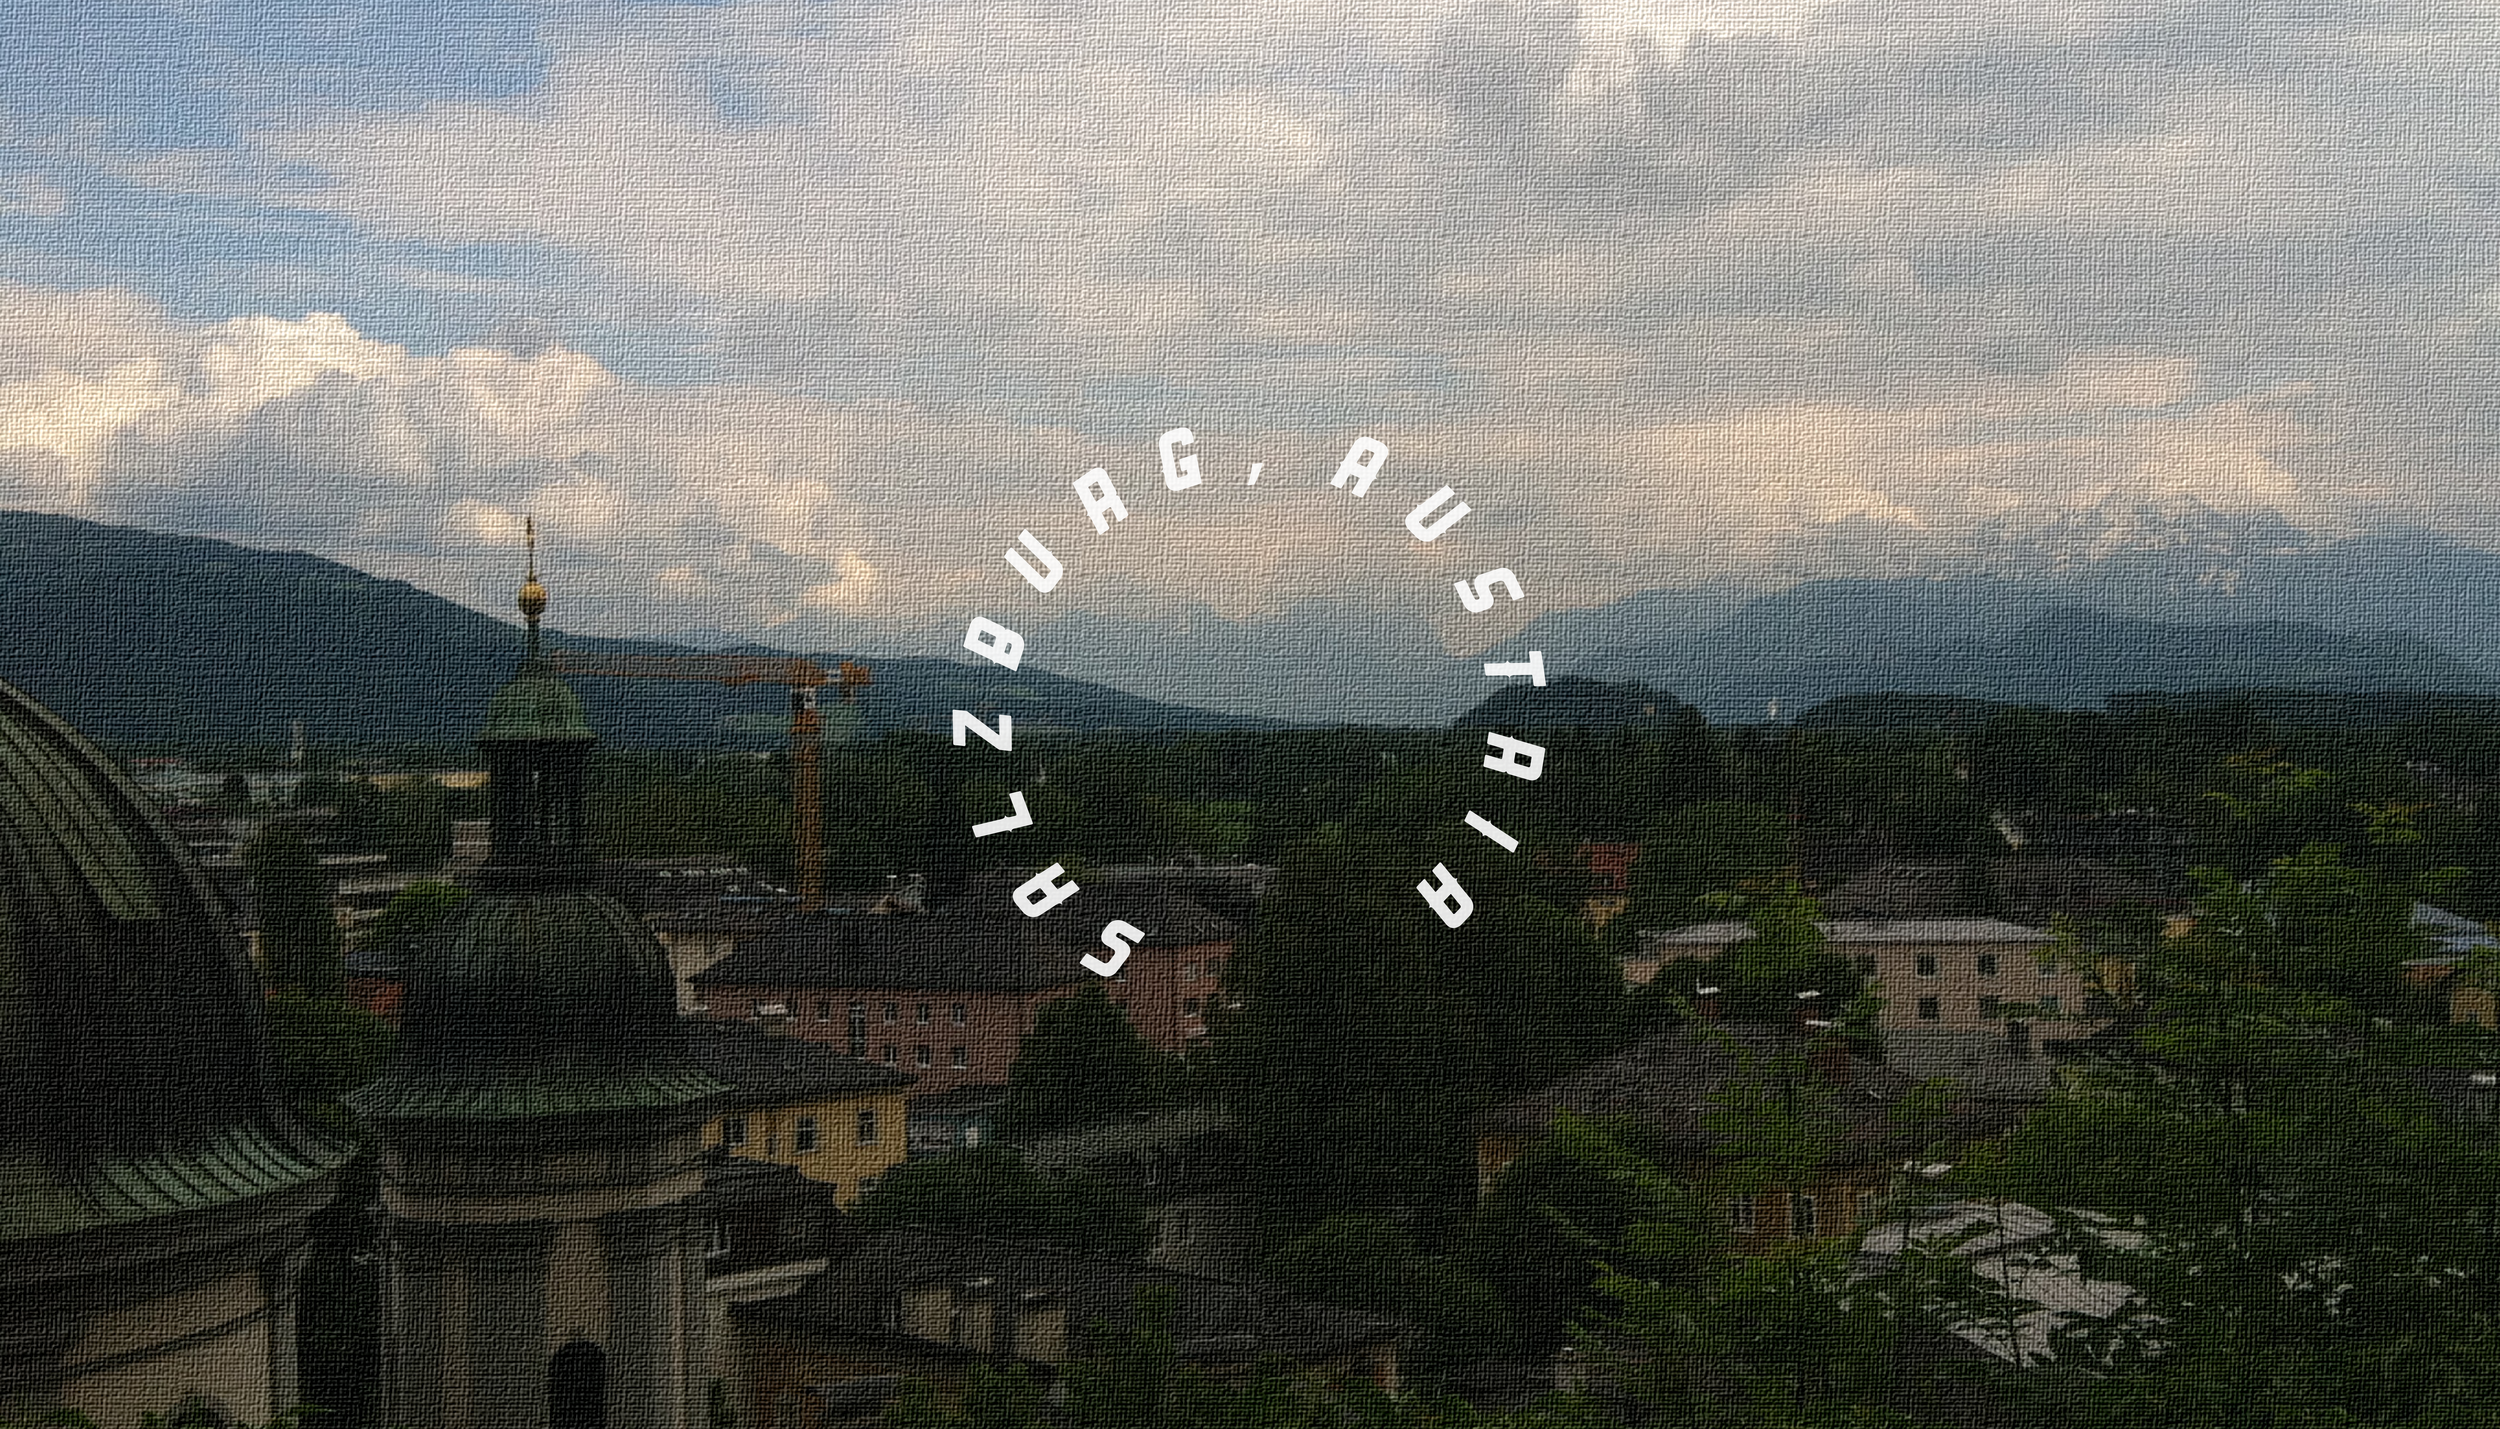 Salzburg canvas_text-02.png